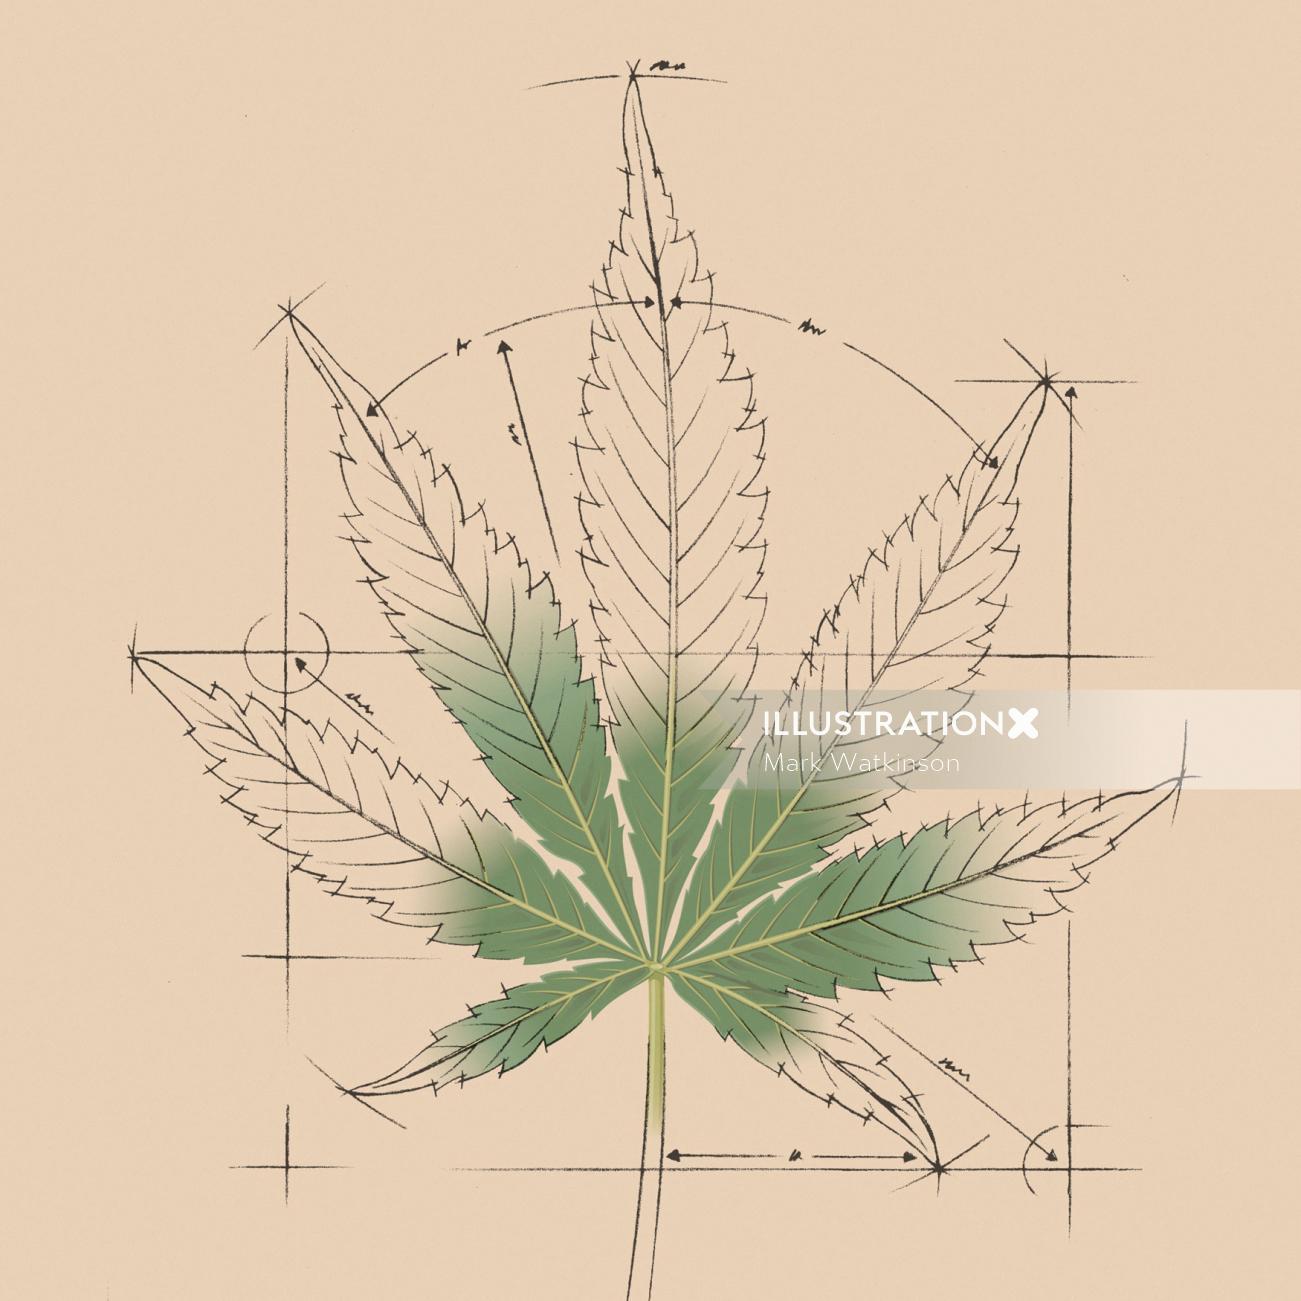 Medical plant illustration by Mark Watkinson